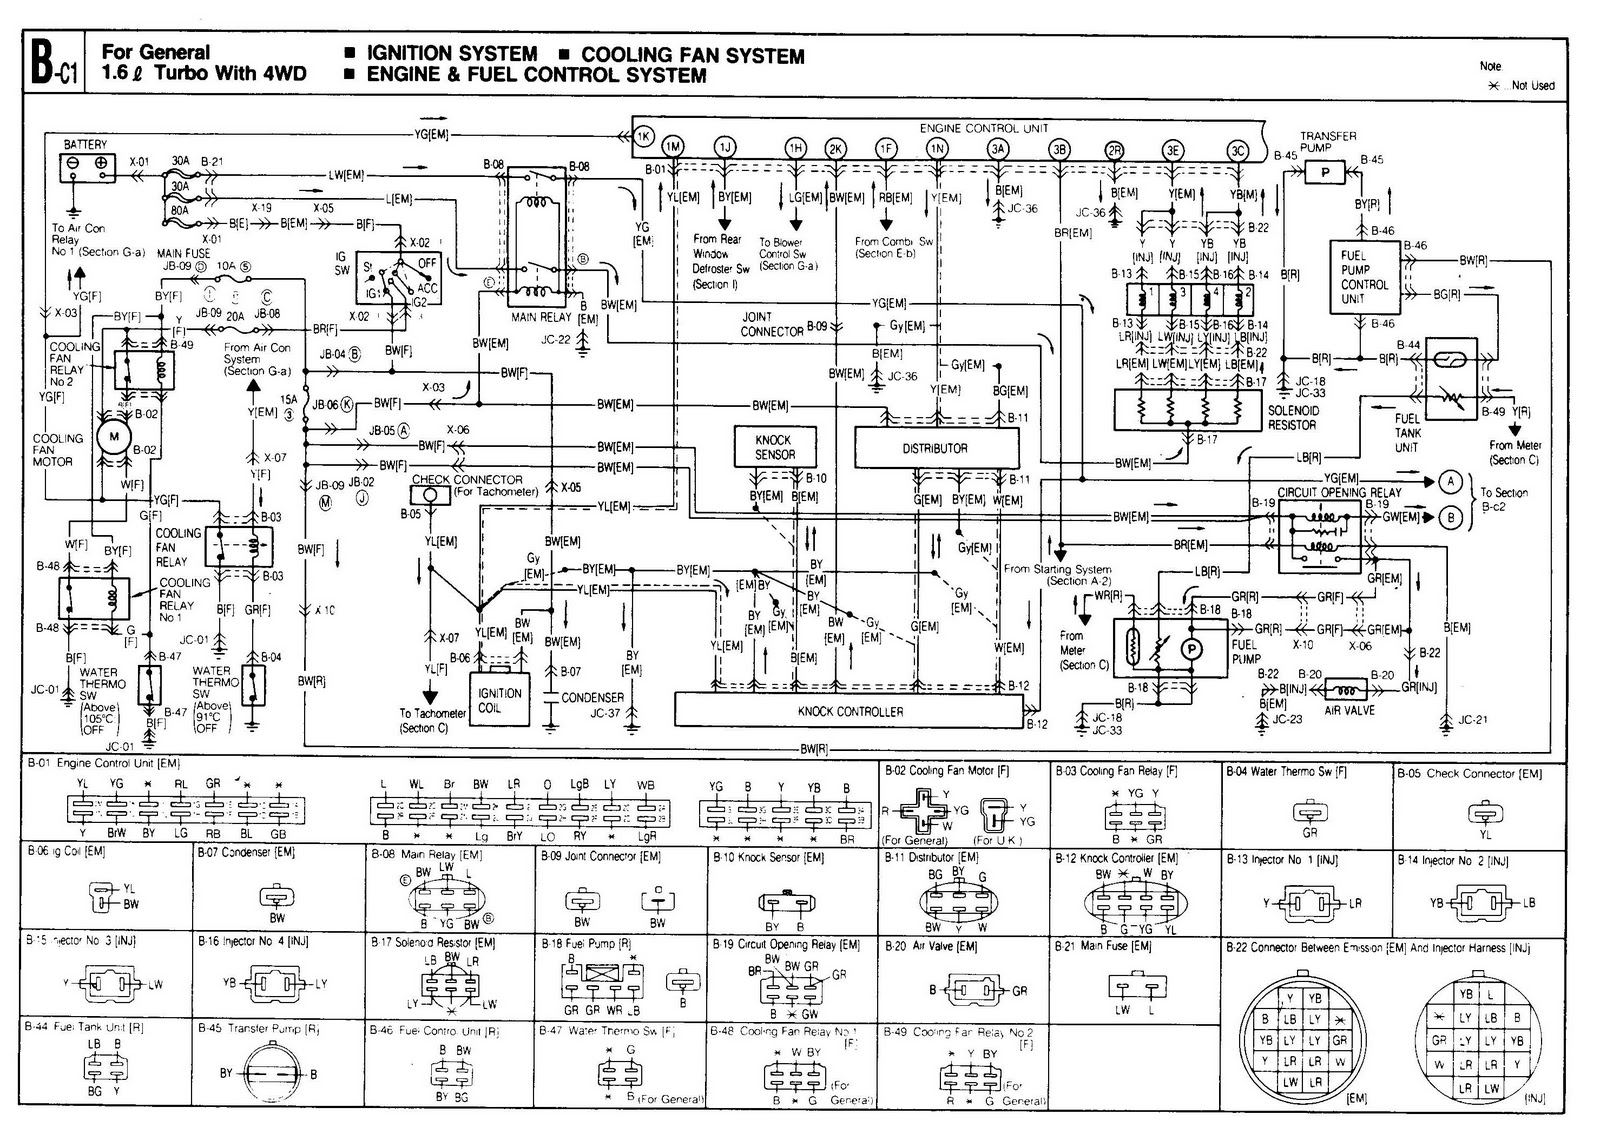 Mazda Understanding Wiring Diagram | Service Manual guide